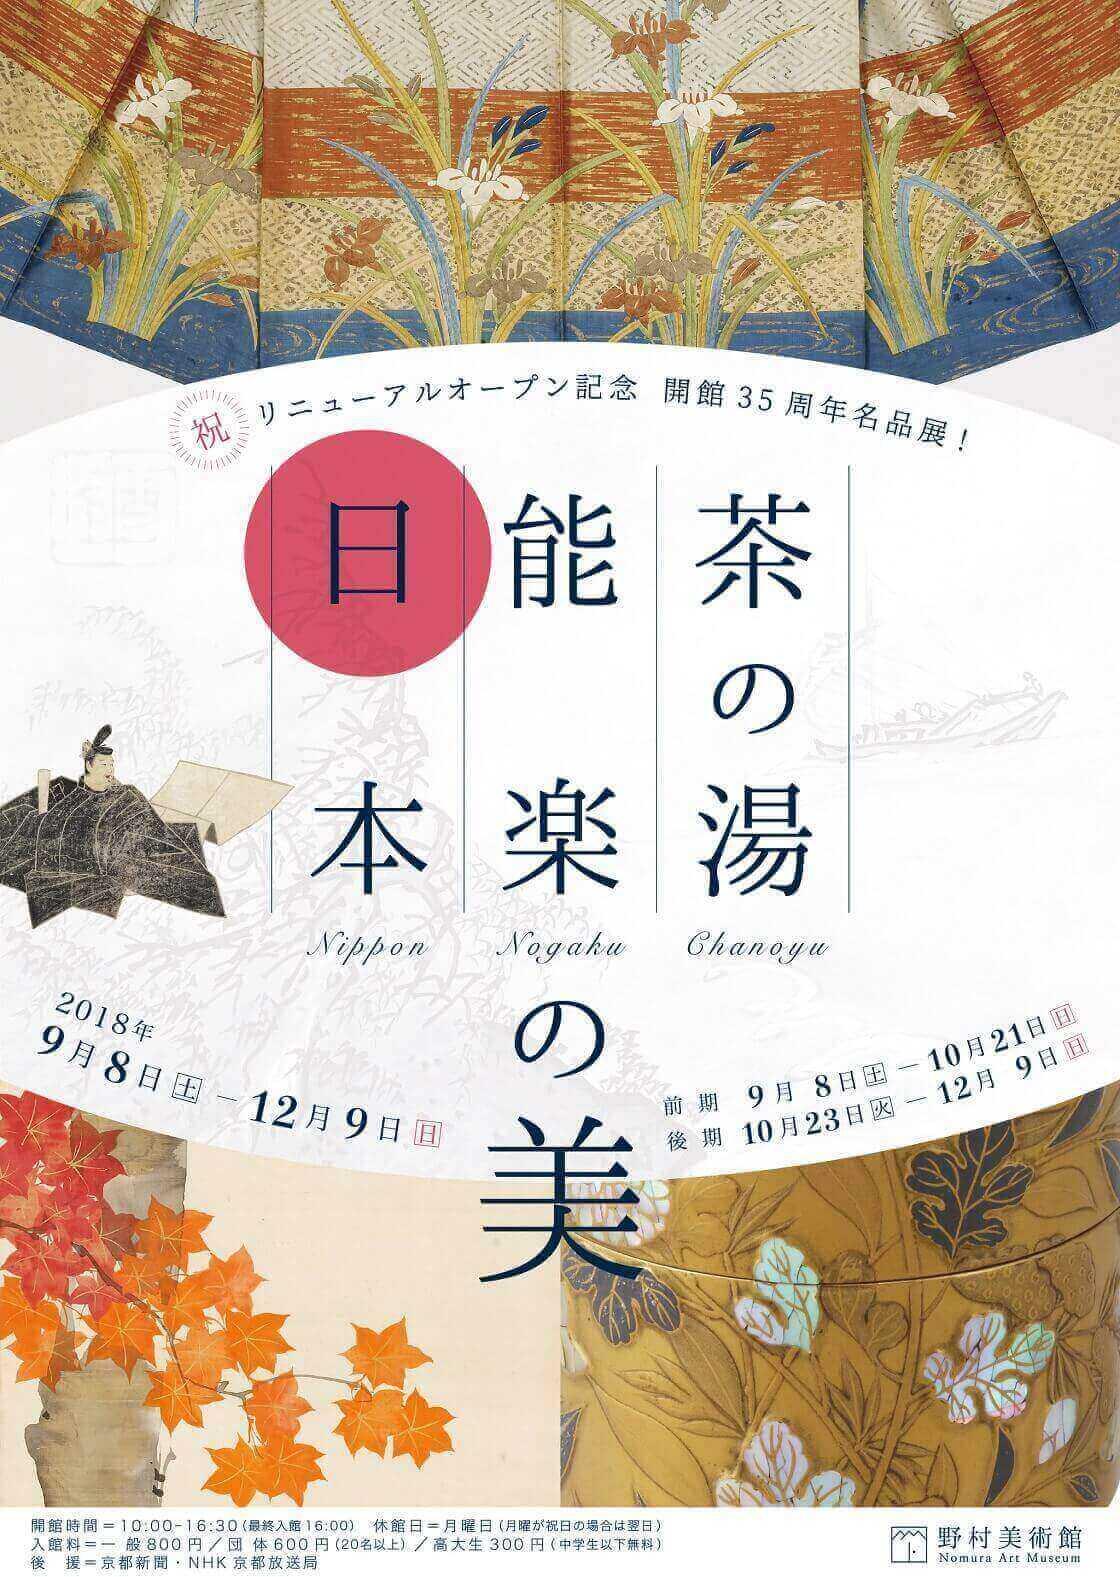 野村美術館の開館35周年名品展